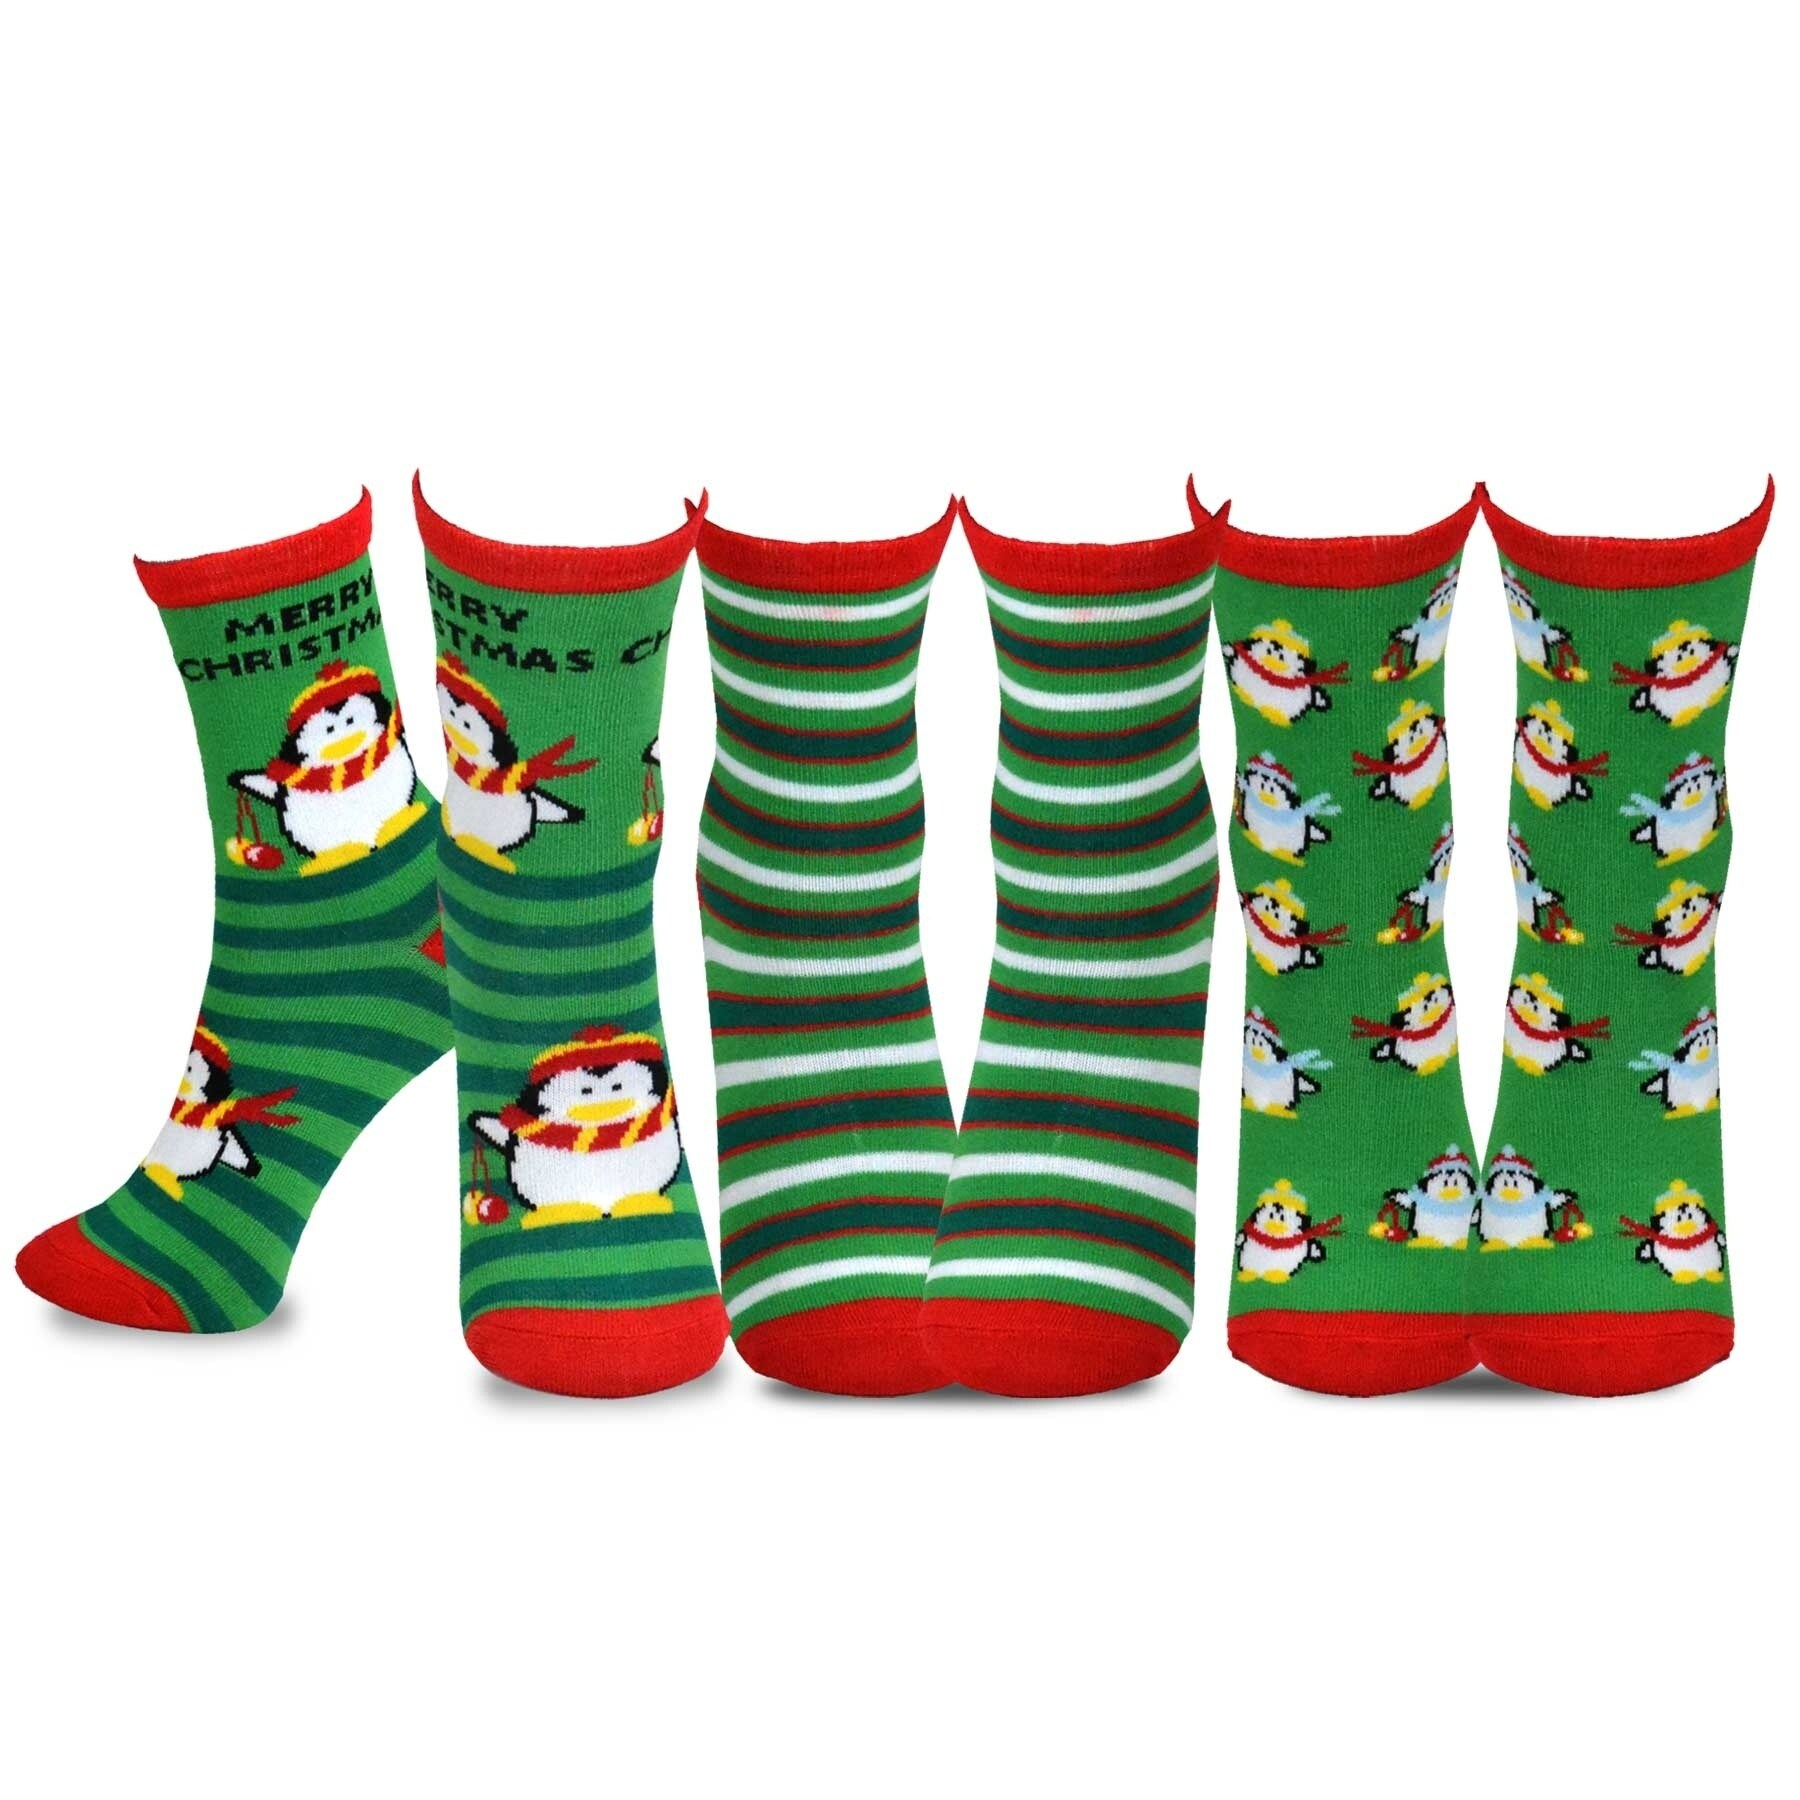 TeeHee Christmas Kids Fun Crew Socks 3-Pair Pack Santa Clause Snowman Holiday